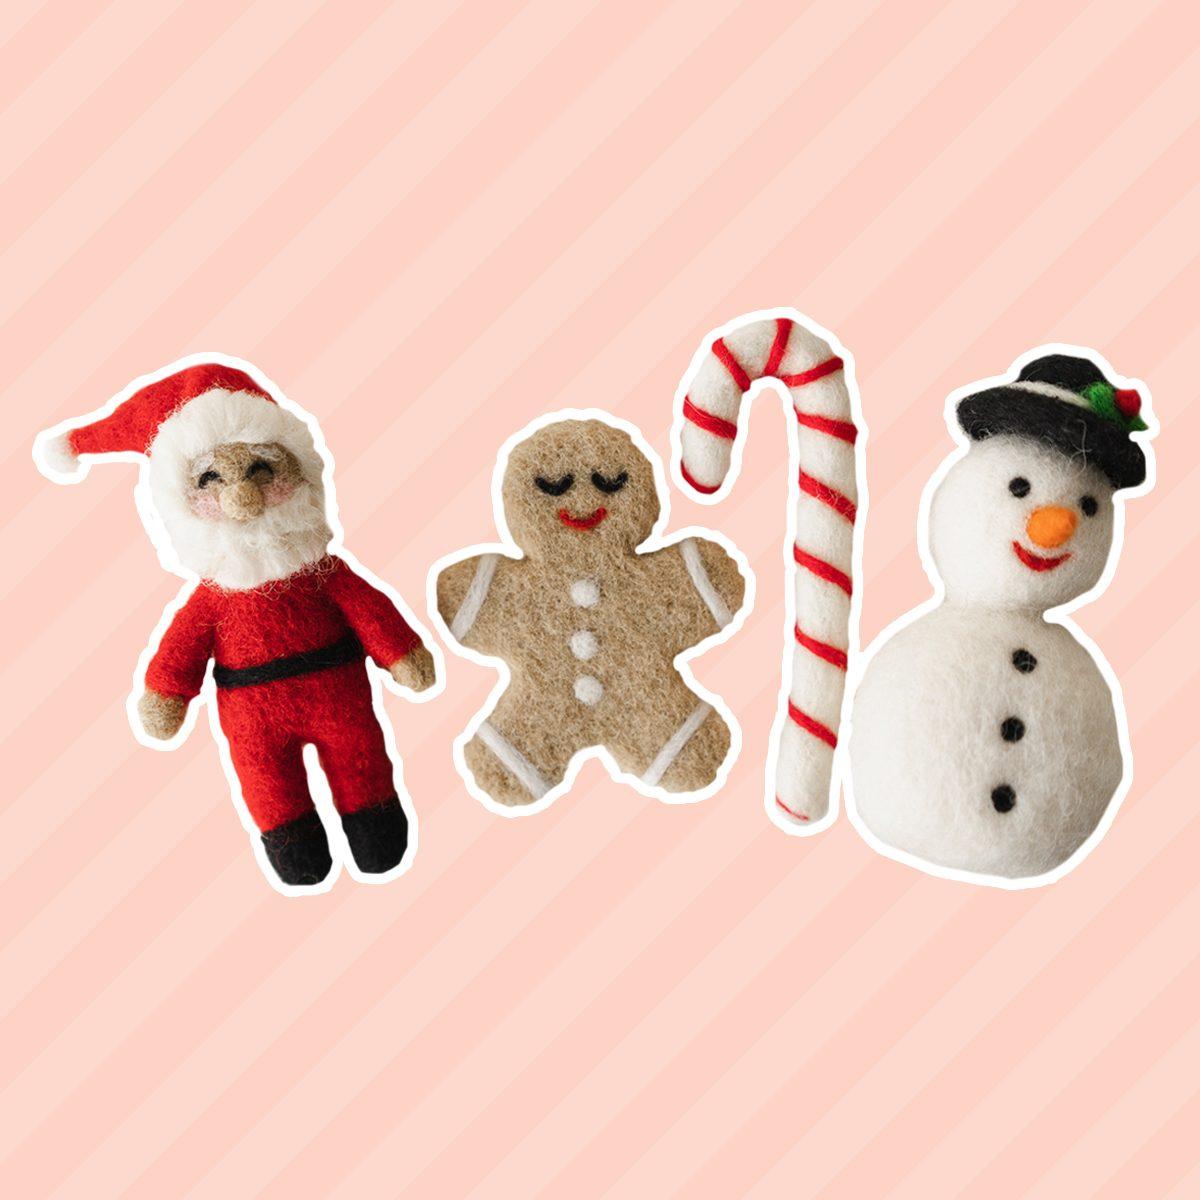 Newborn Christmas Toys,Newborn Toy,Newborn Knitted Toy,Newborn Santa Claus Toy,Newborn Snowman Felted Toy,Christmas Lollipop,Gingerbread Man